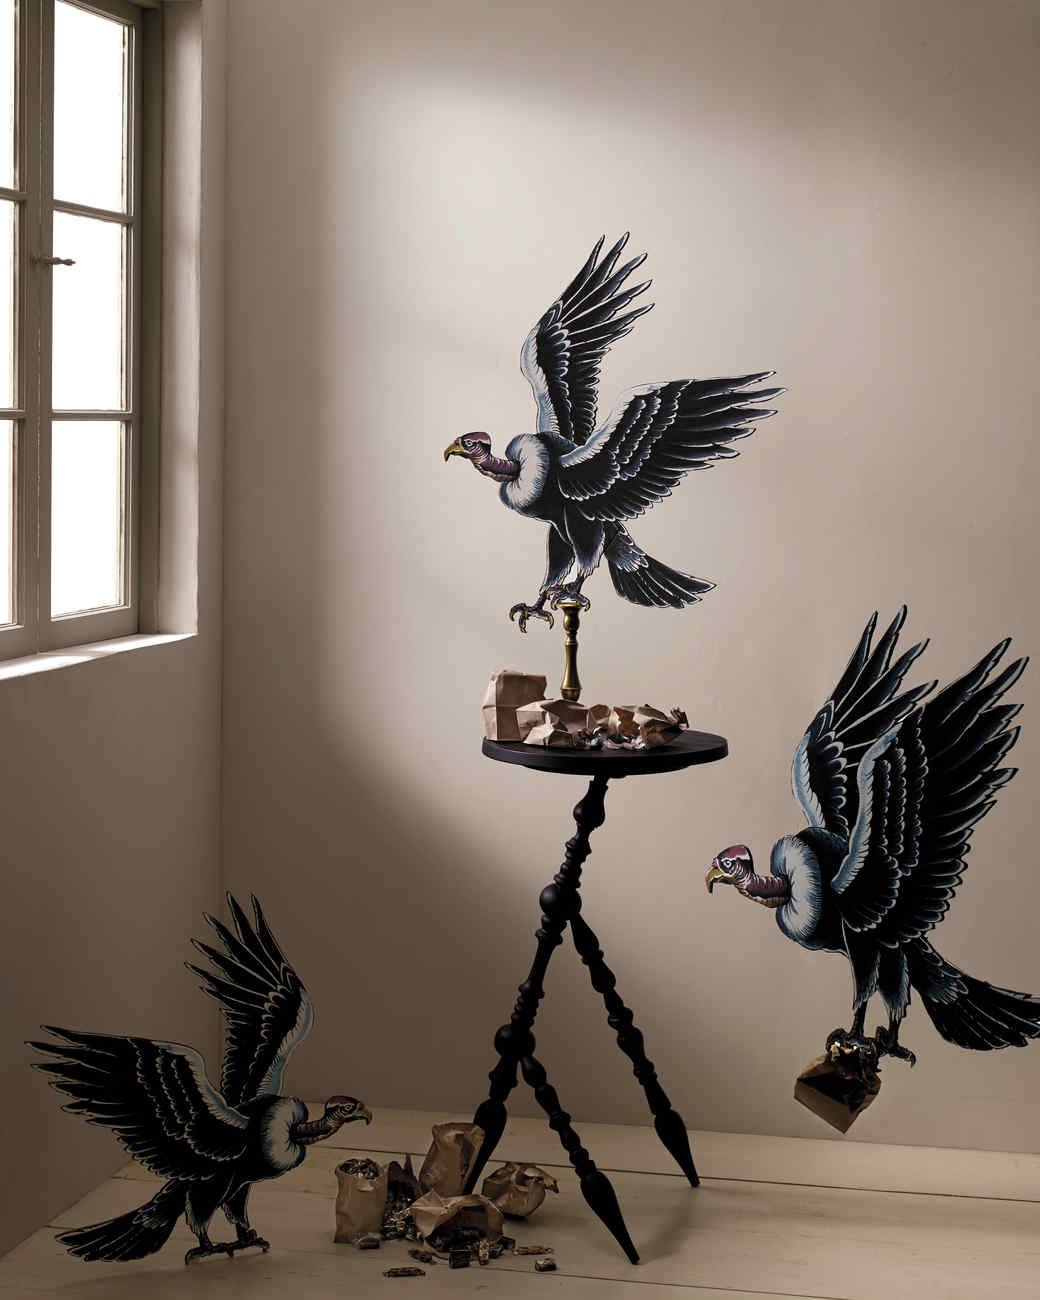 vulture-treat-table-001-md110411.jpg